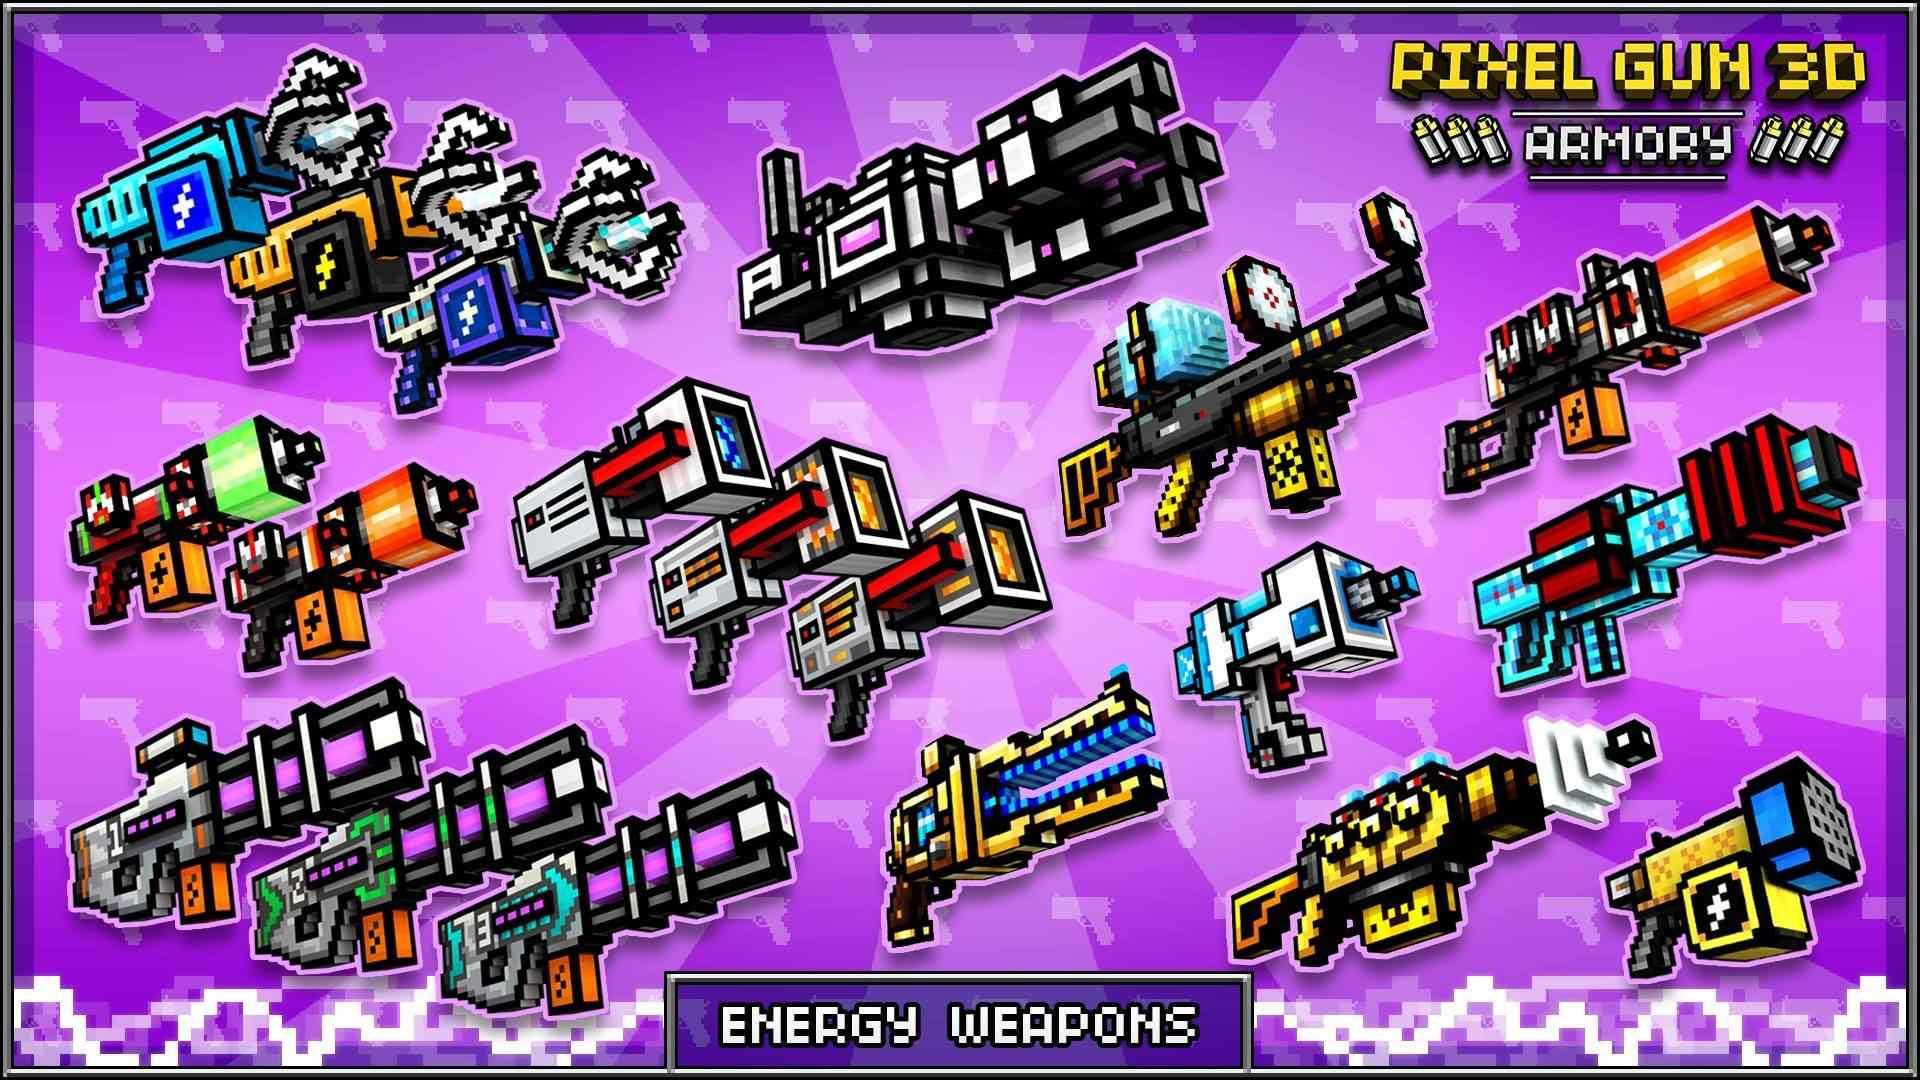 Pixel Gun 3D: Weaponry Statistics